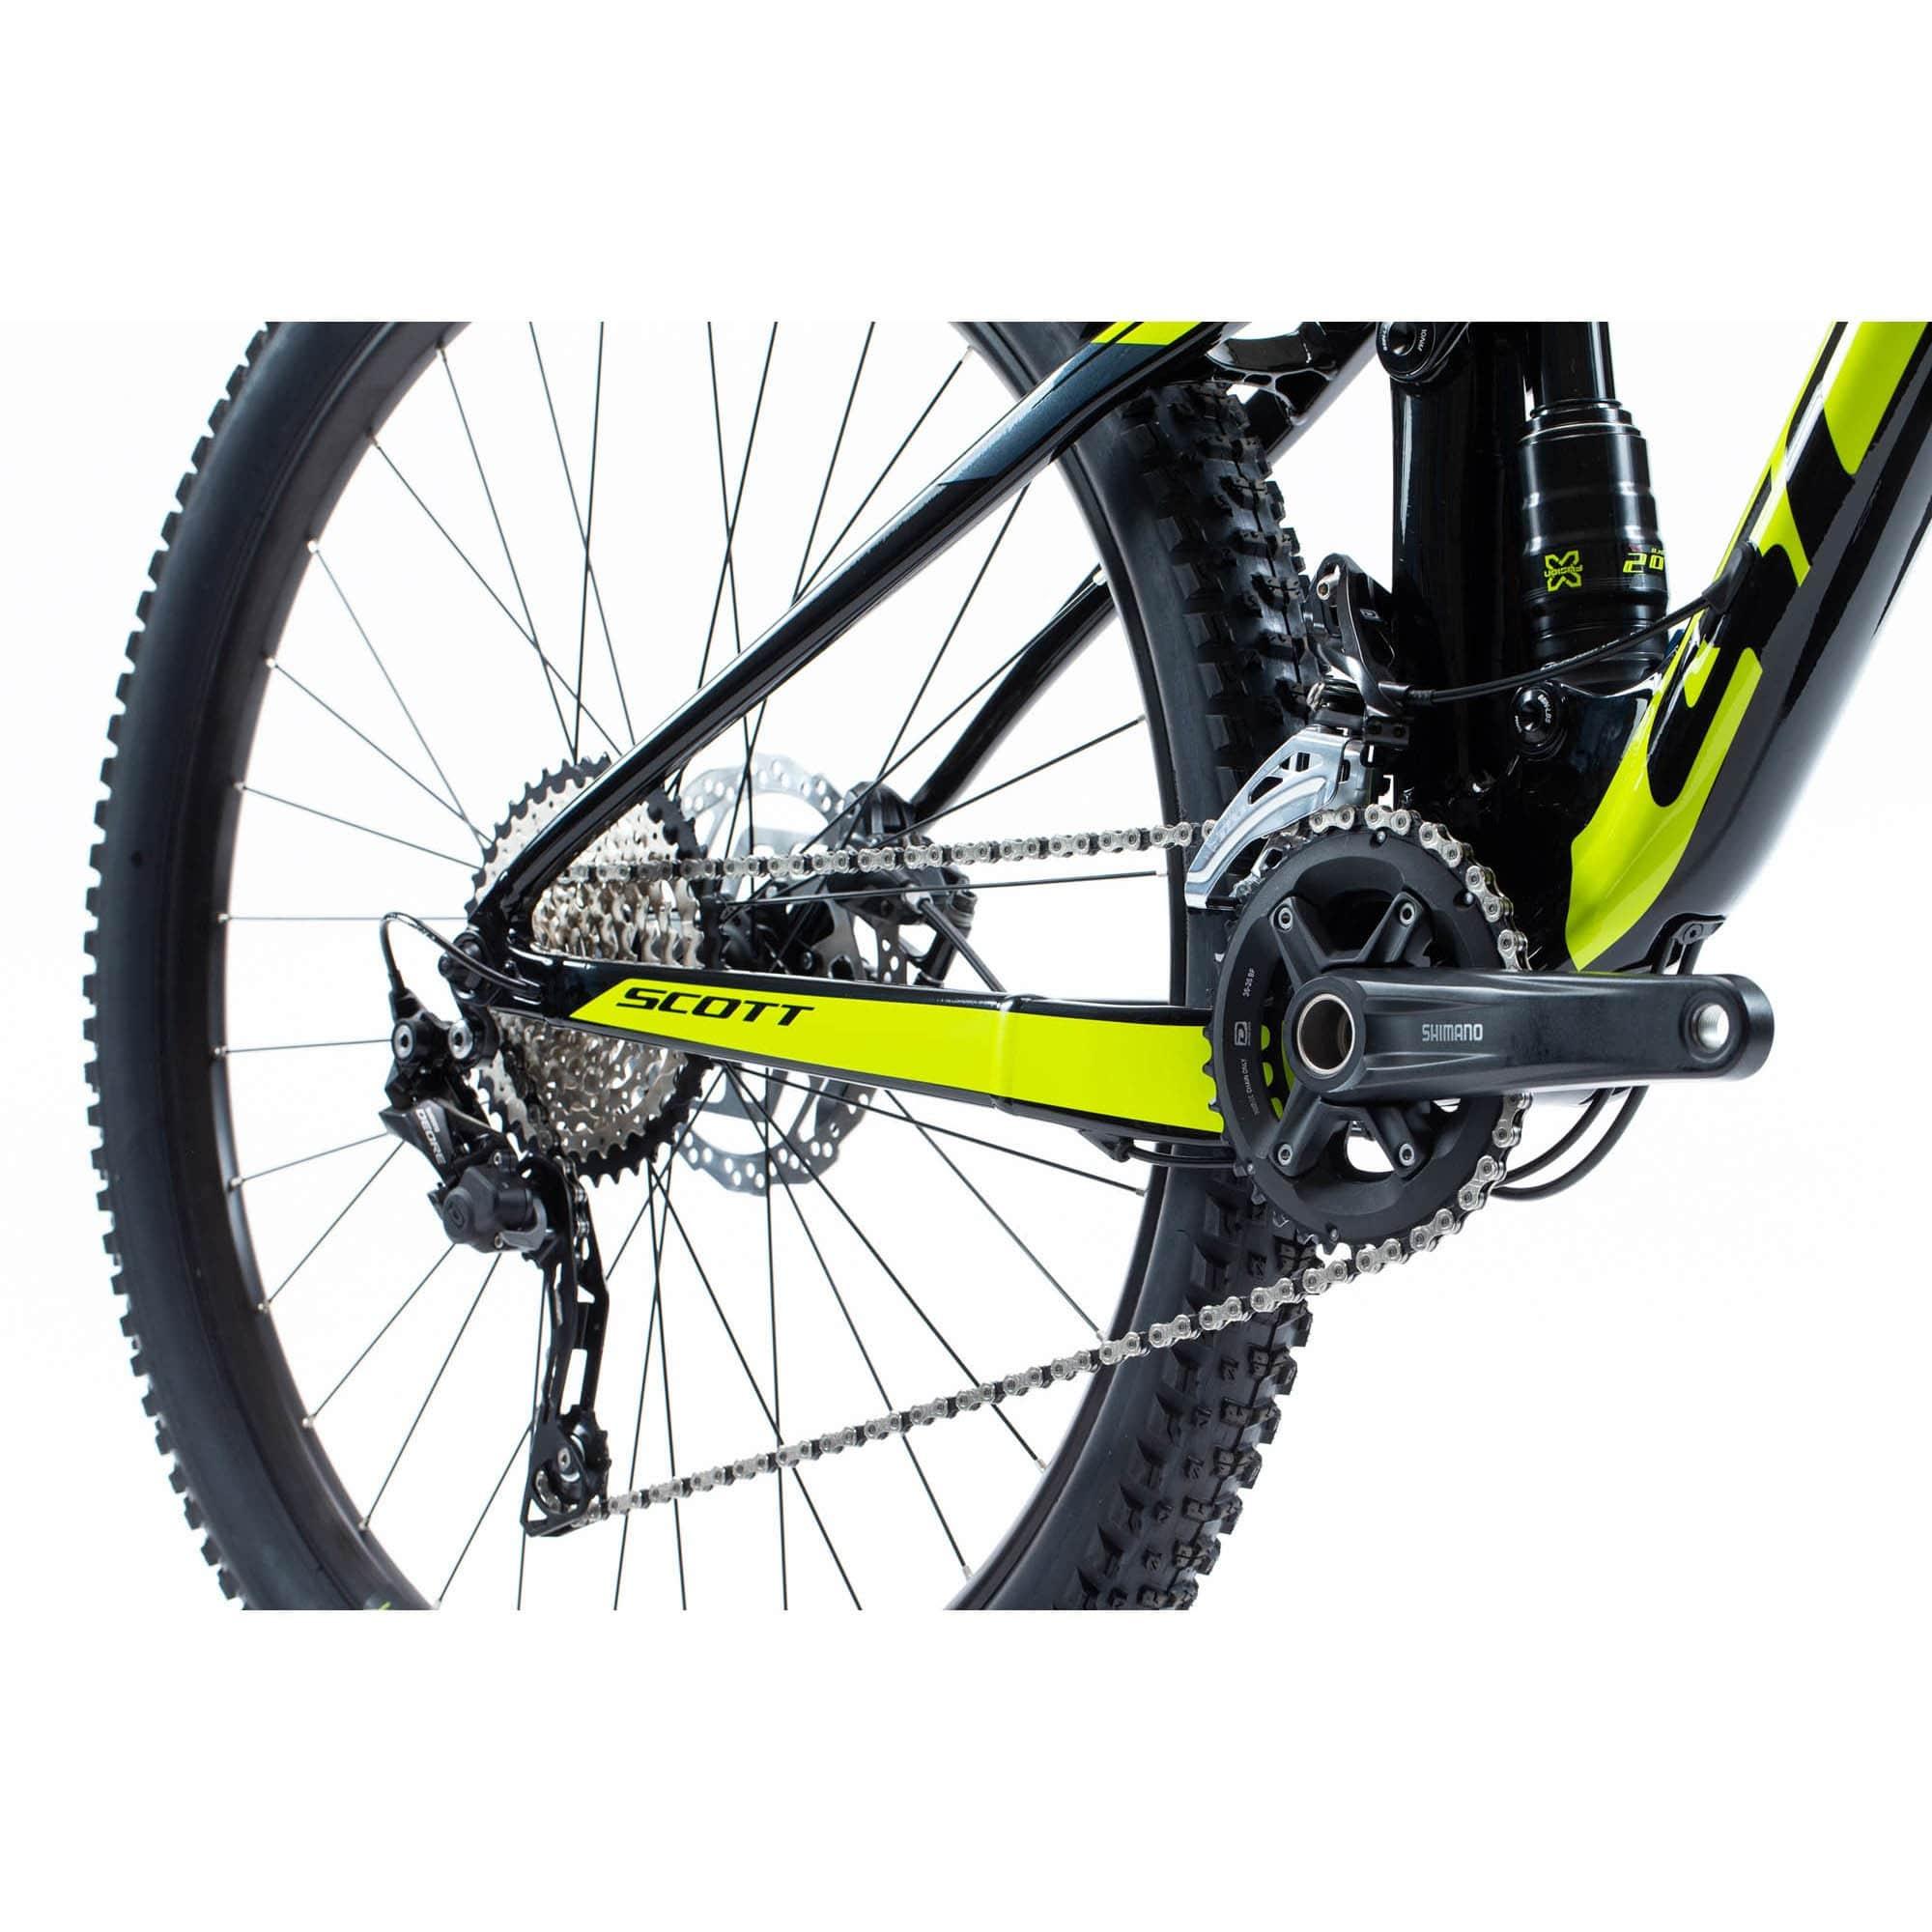 Bicicleta Scott Spark 970 2019